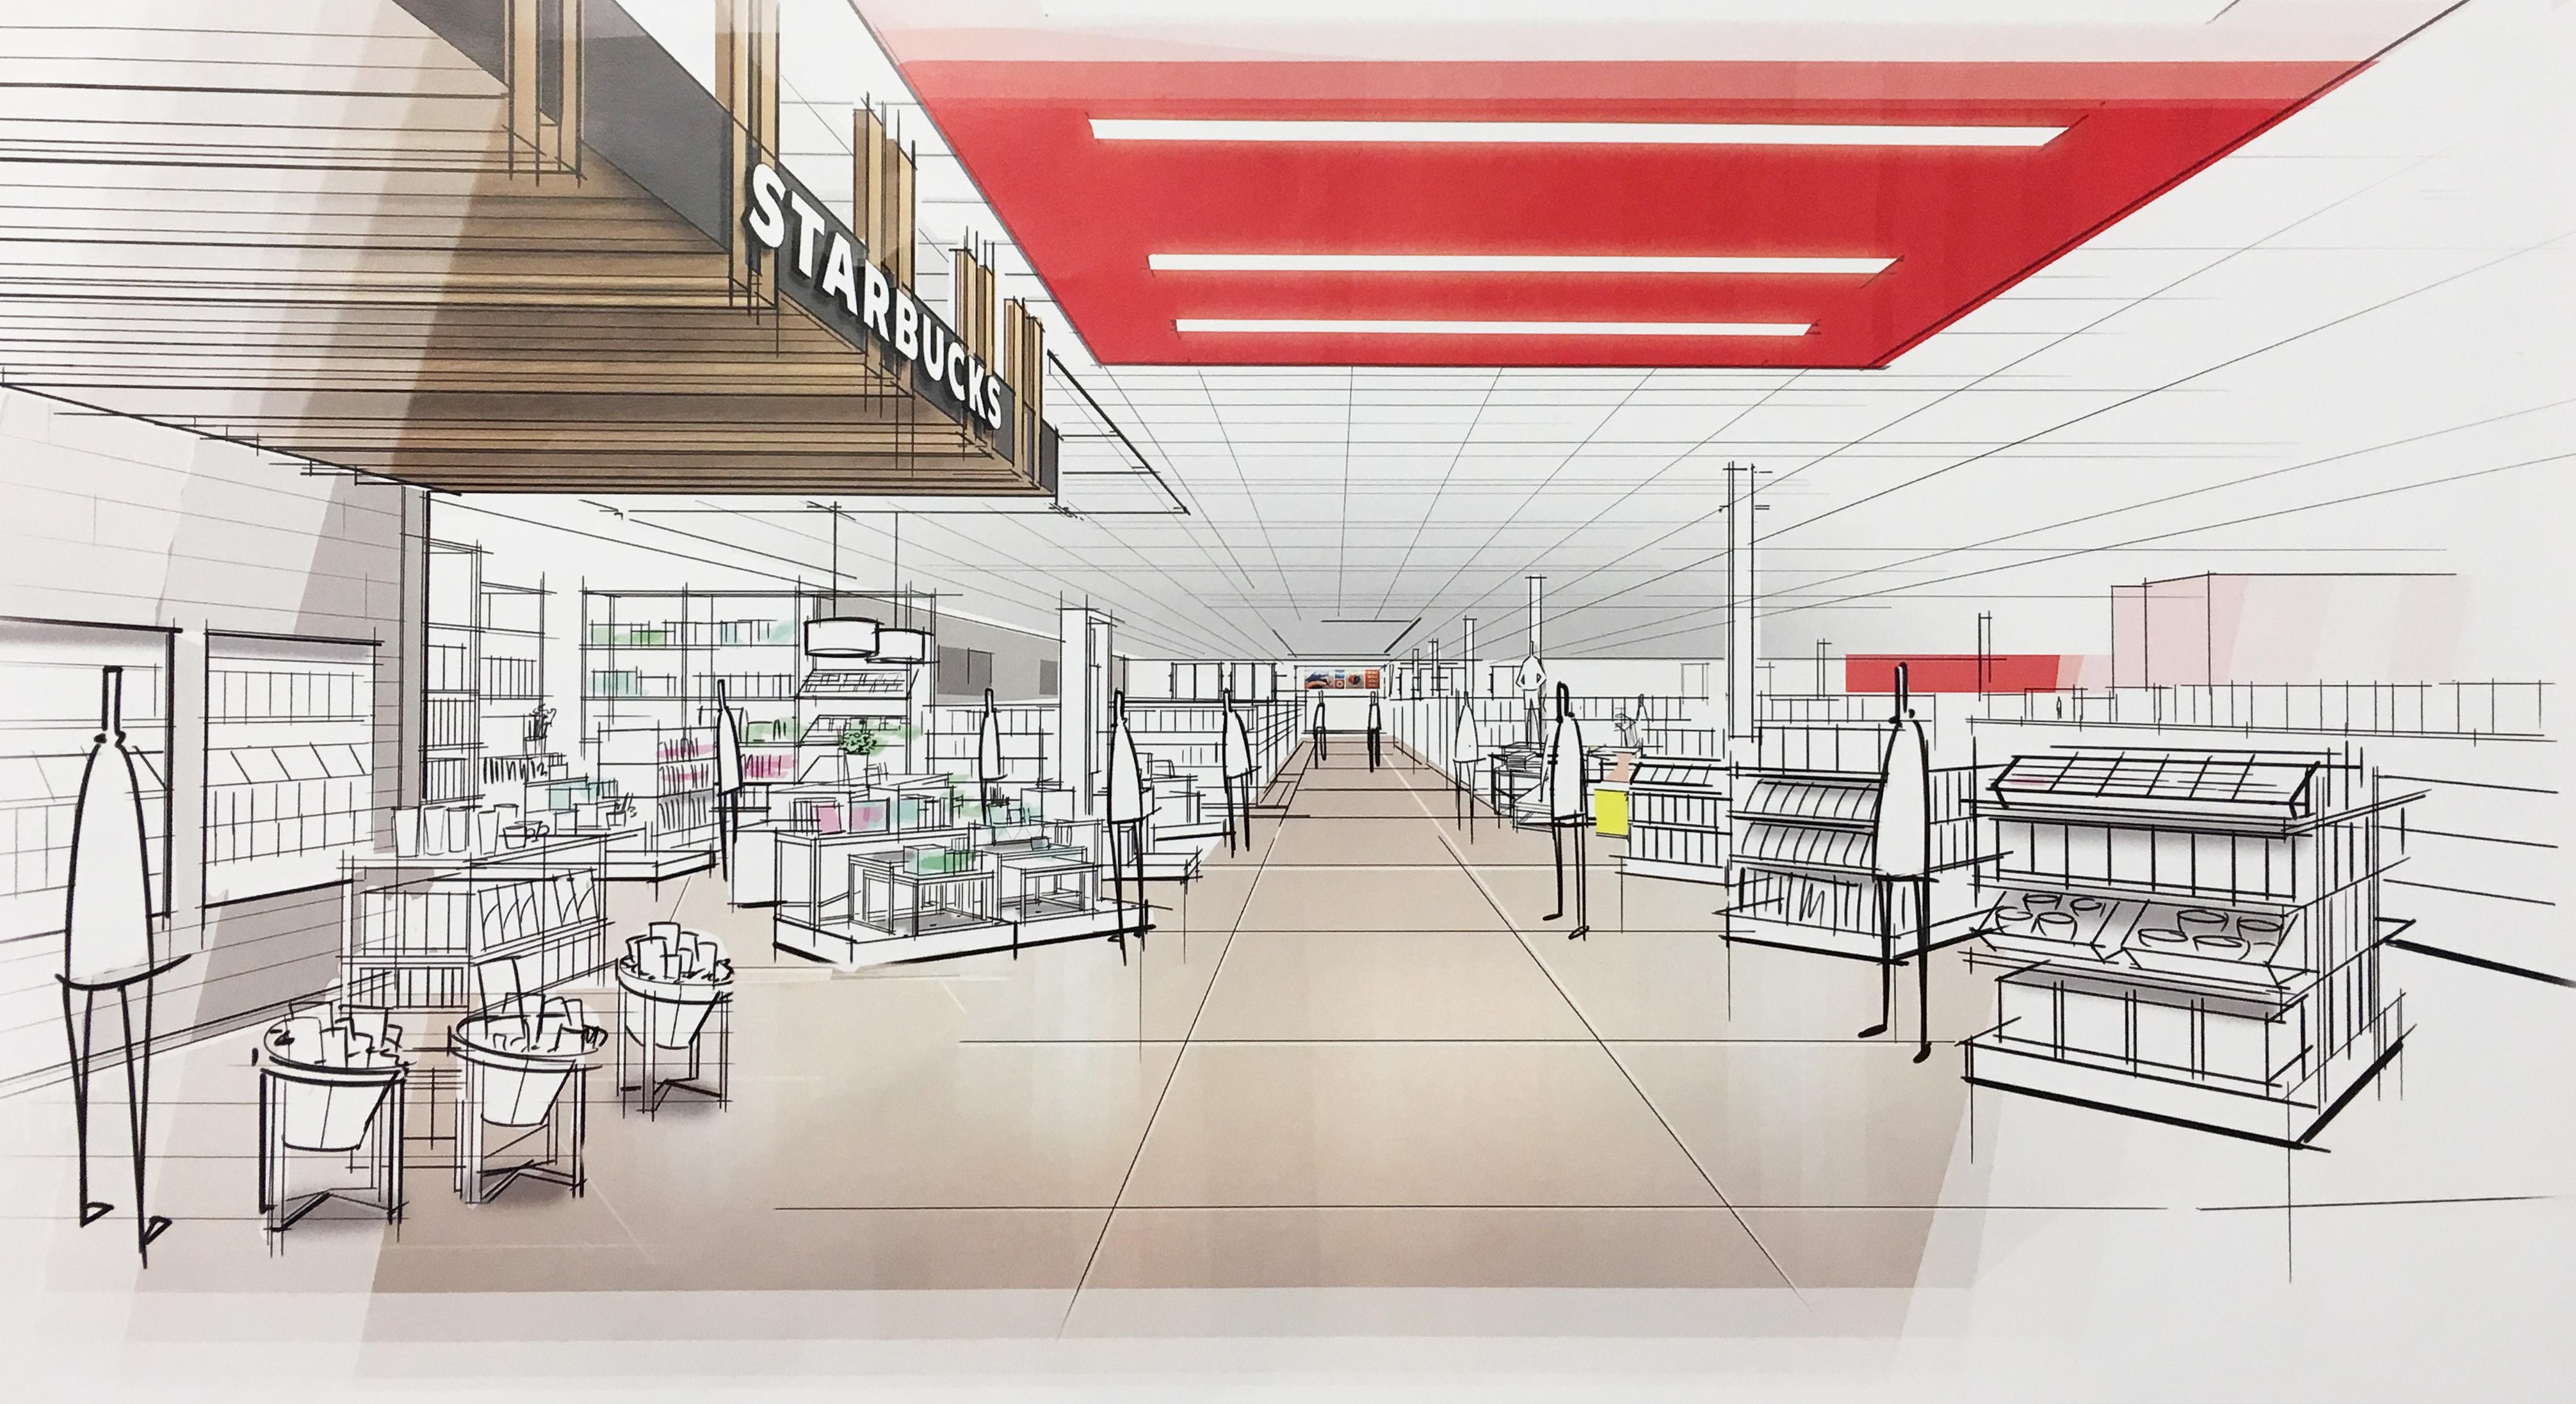 Target Reveals Design Elements of Next Generation of Stores ...